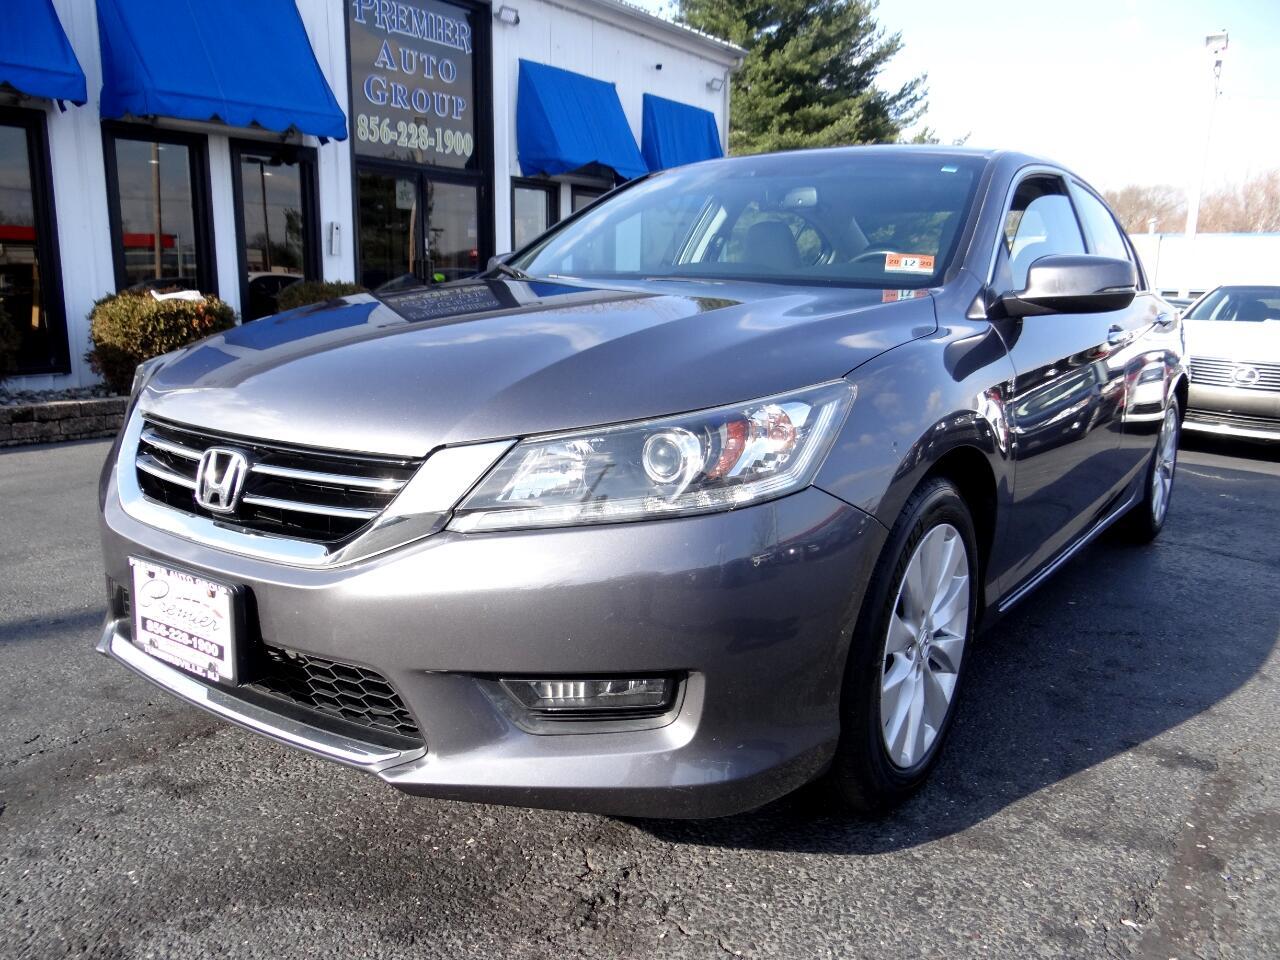 2014 Honda Accord Sedan 4dr I4 CVT EX-L w/Navi & Honda Sensing